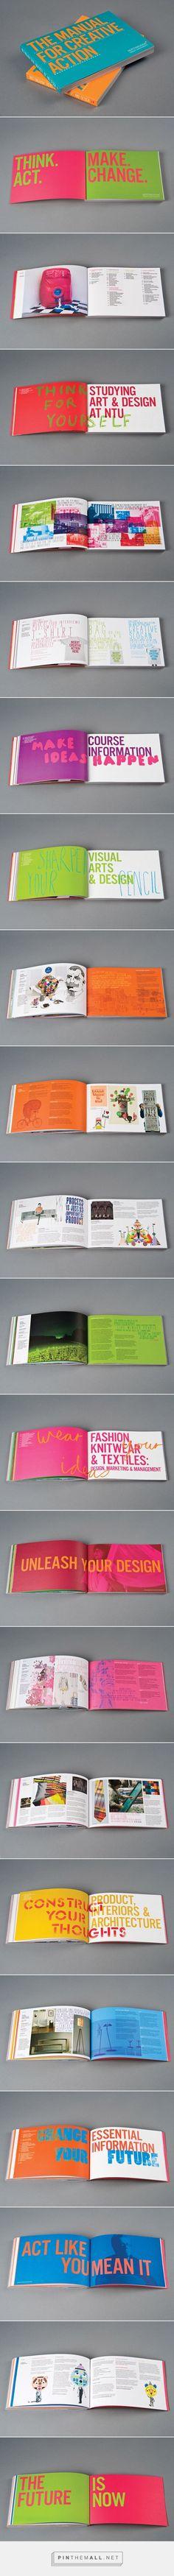 NTU Art & Design Book 10/11 by Andrew Townsend